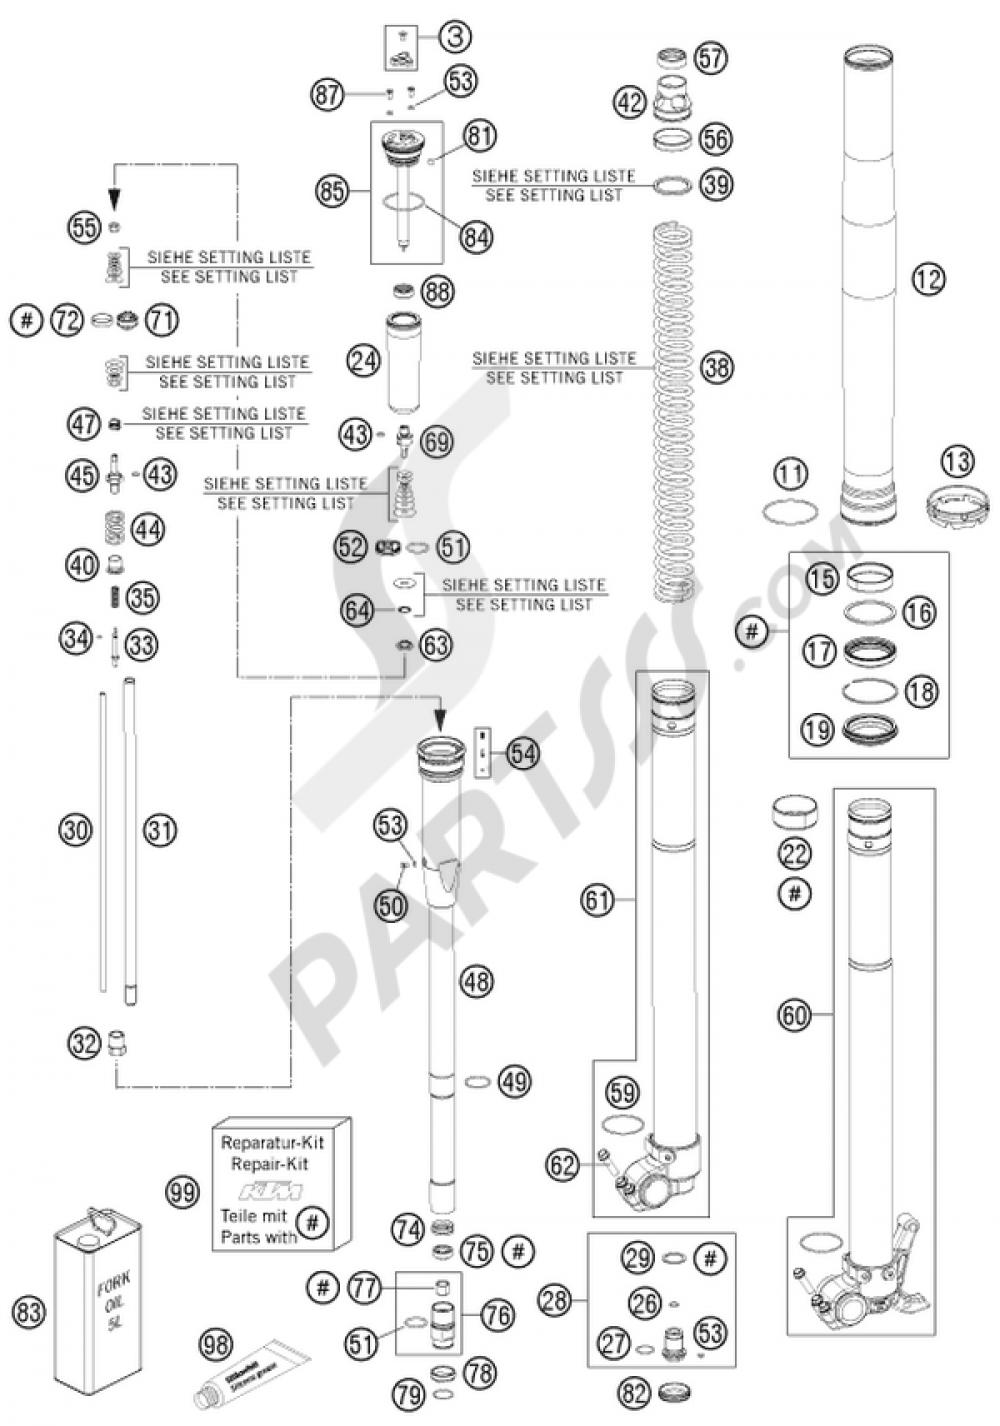 Front Fork Disassembled Ktm 450 Smr 2010 Eu Wire Schematic